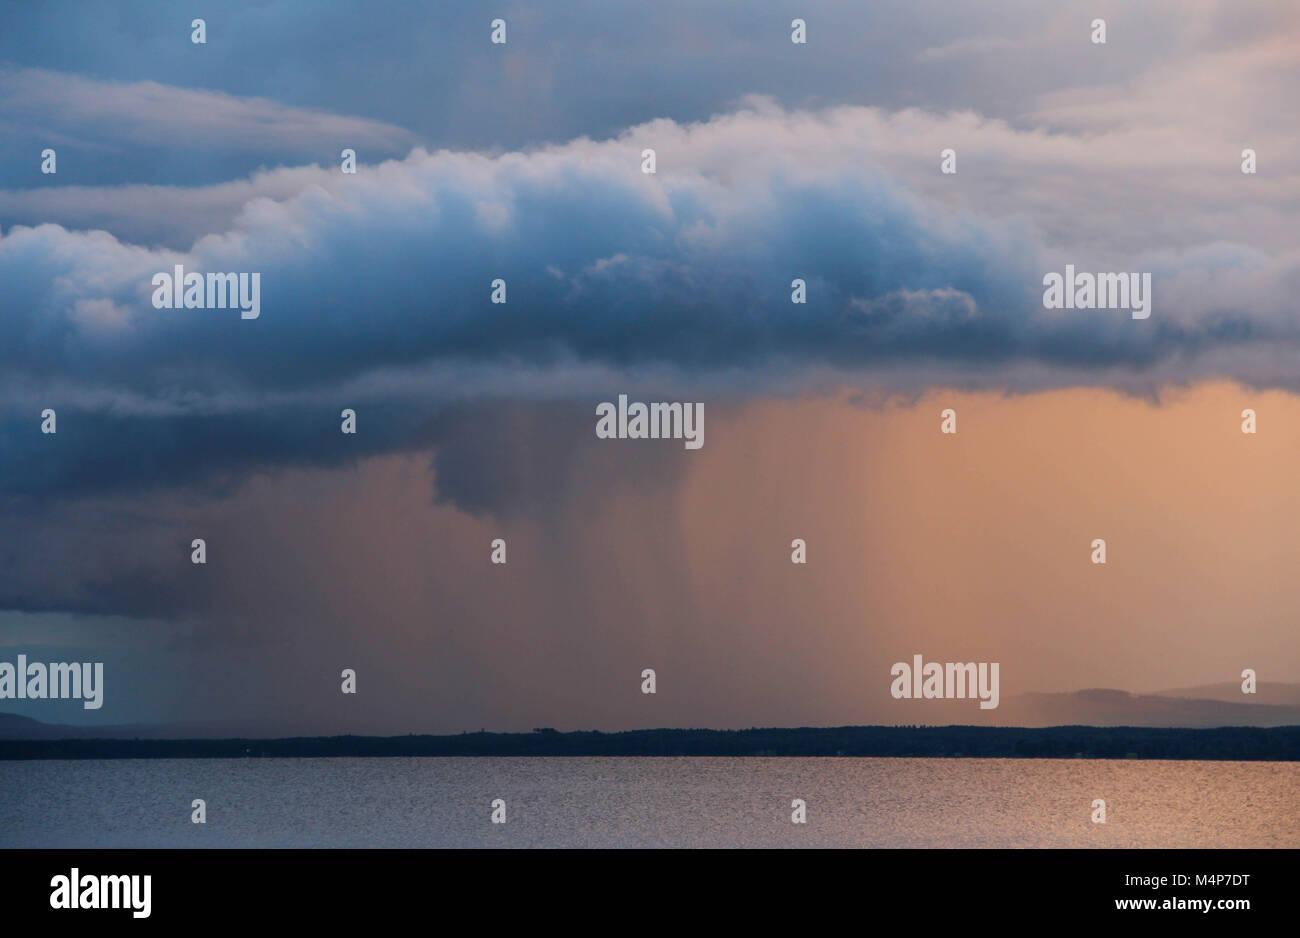 Rain cloud at sunset over Orsa lake in Dalarna, Swden. - Stock Image